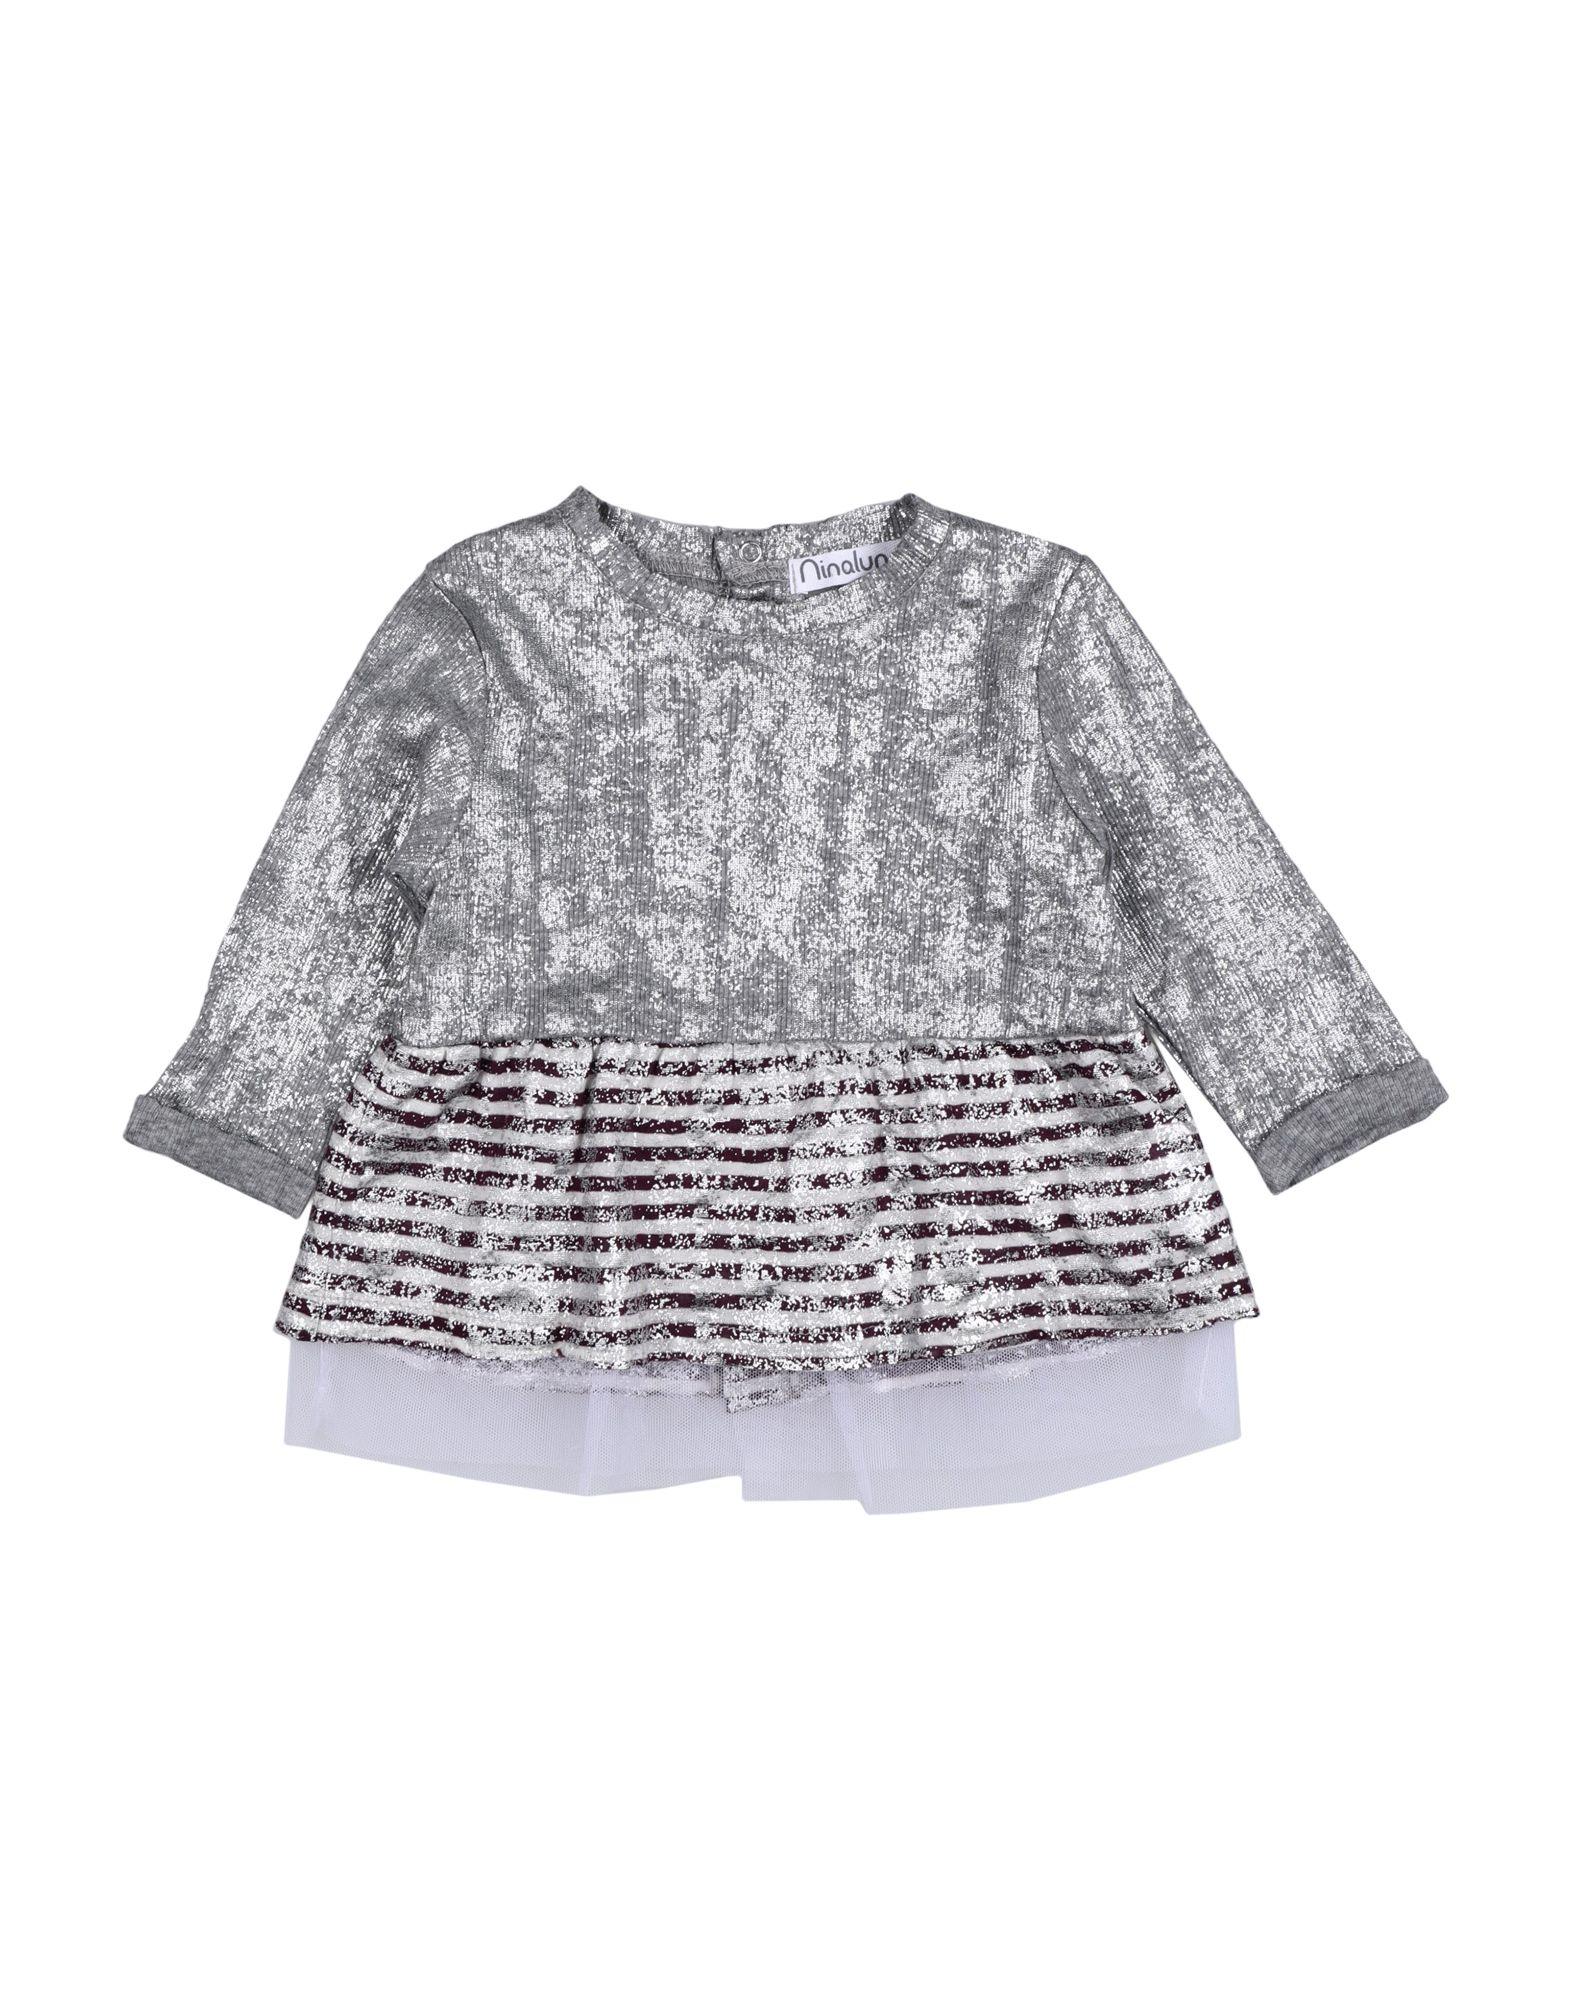 Ninaluna Kids' T-shirts In Gray